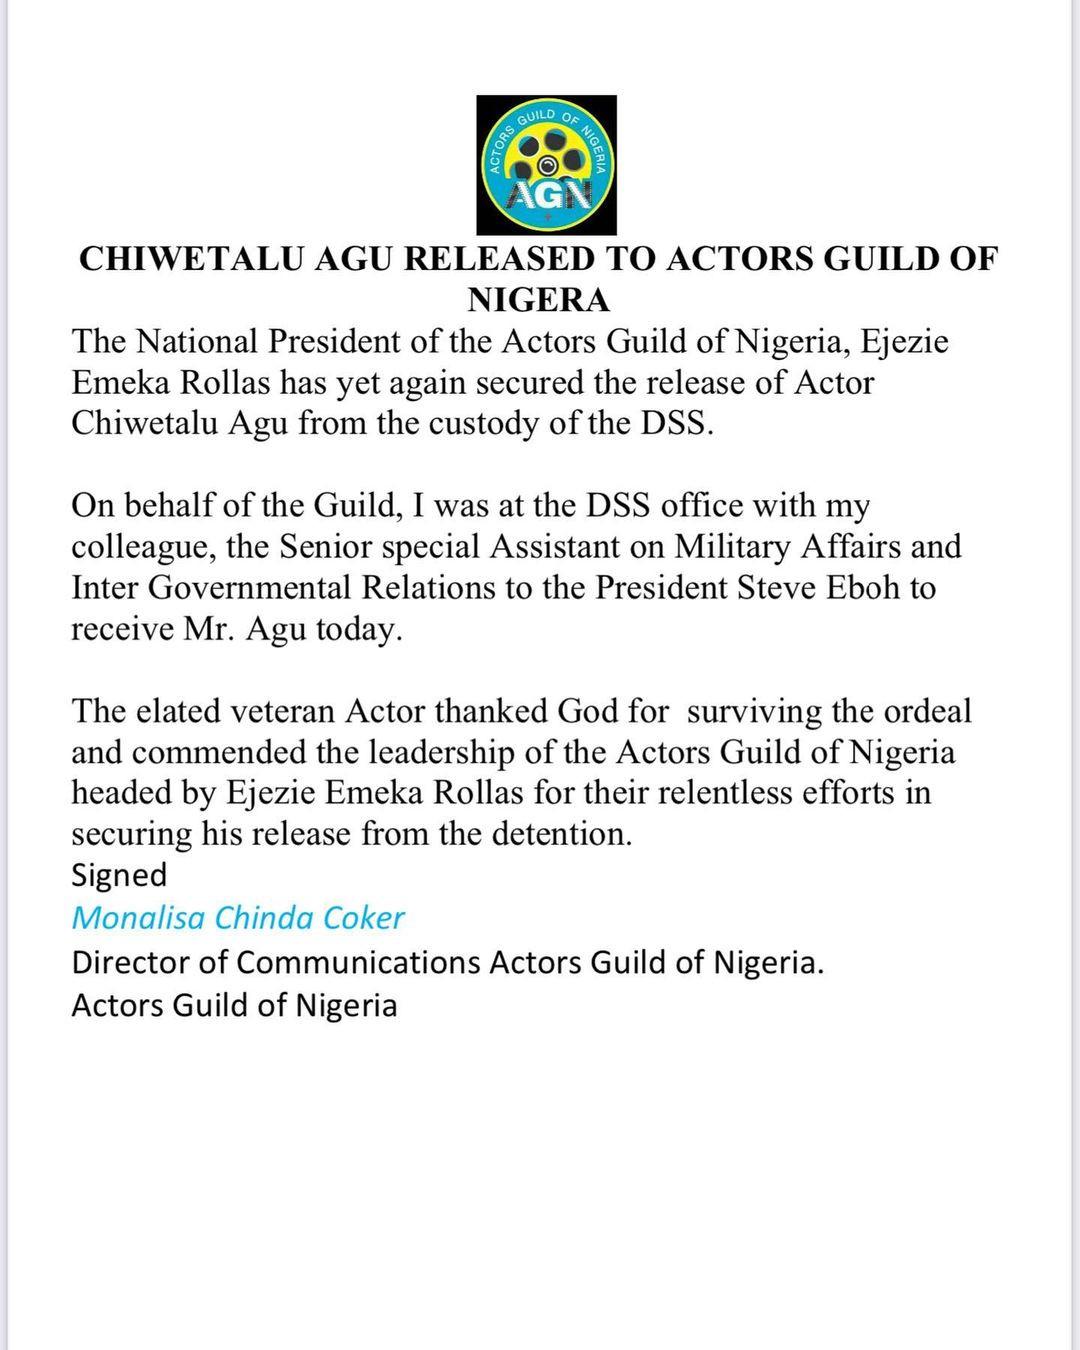 Update: Actor Chiwetalu Agu released from DSS custody